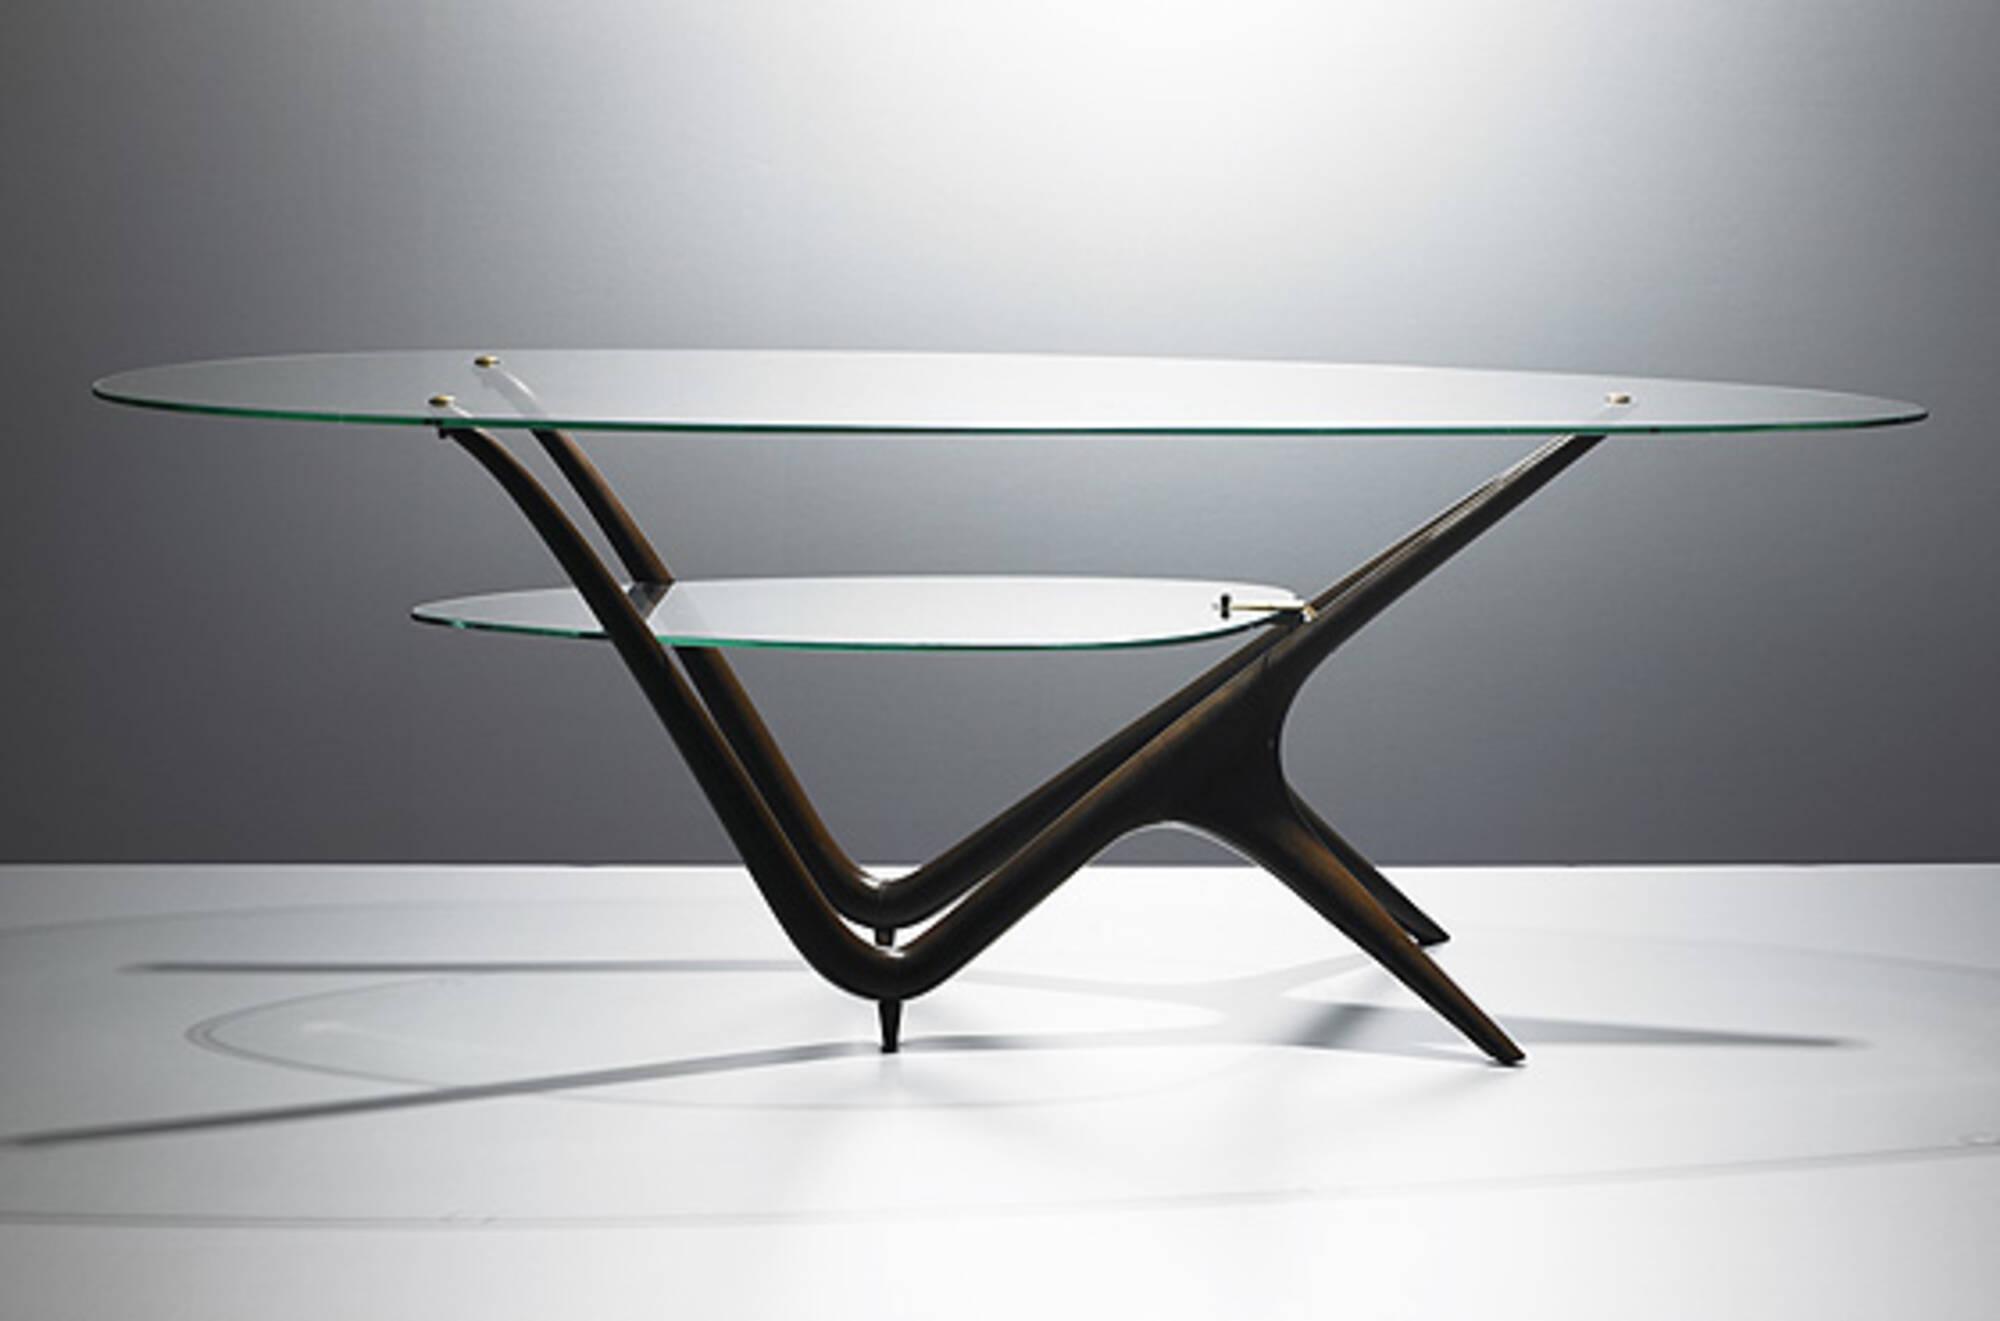 Marvelous 335 Carlo Mollino Coffee Table Model 1114 Modern Inzonedesignstudio Interior Chair Design Inzonedesignstudiocom